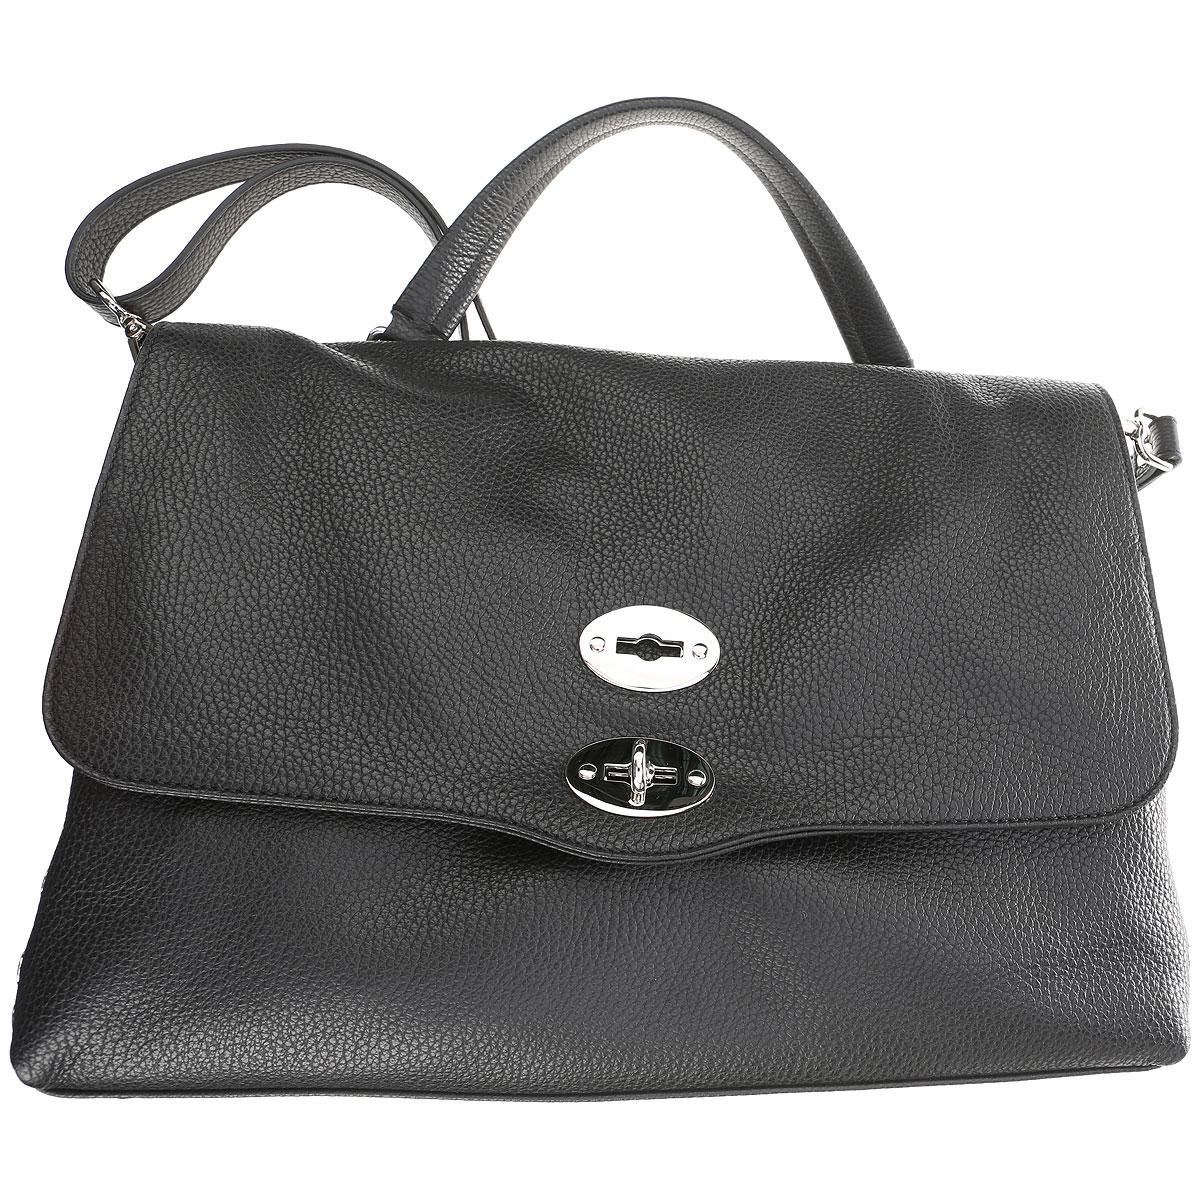 Image of Zanellato Shoulder Bag for Women, Black, Leather, 2017